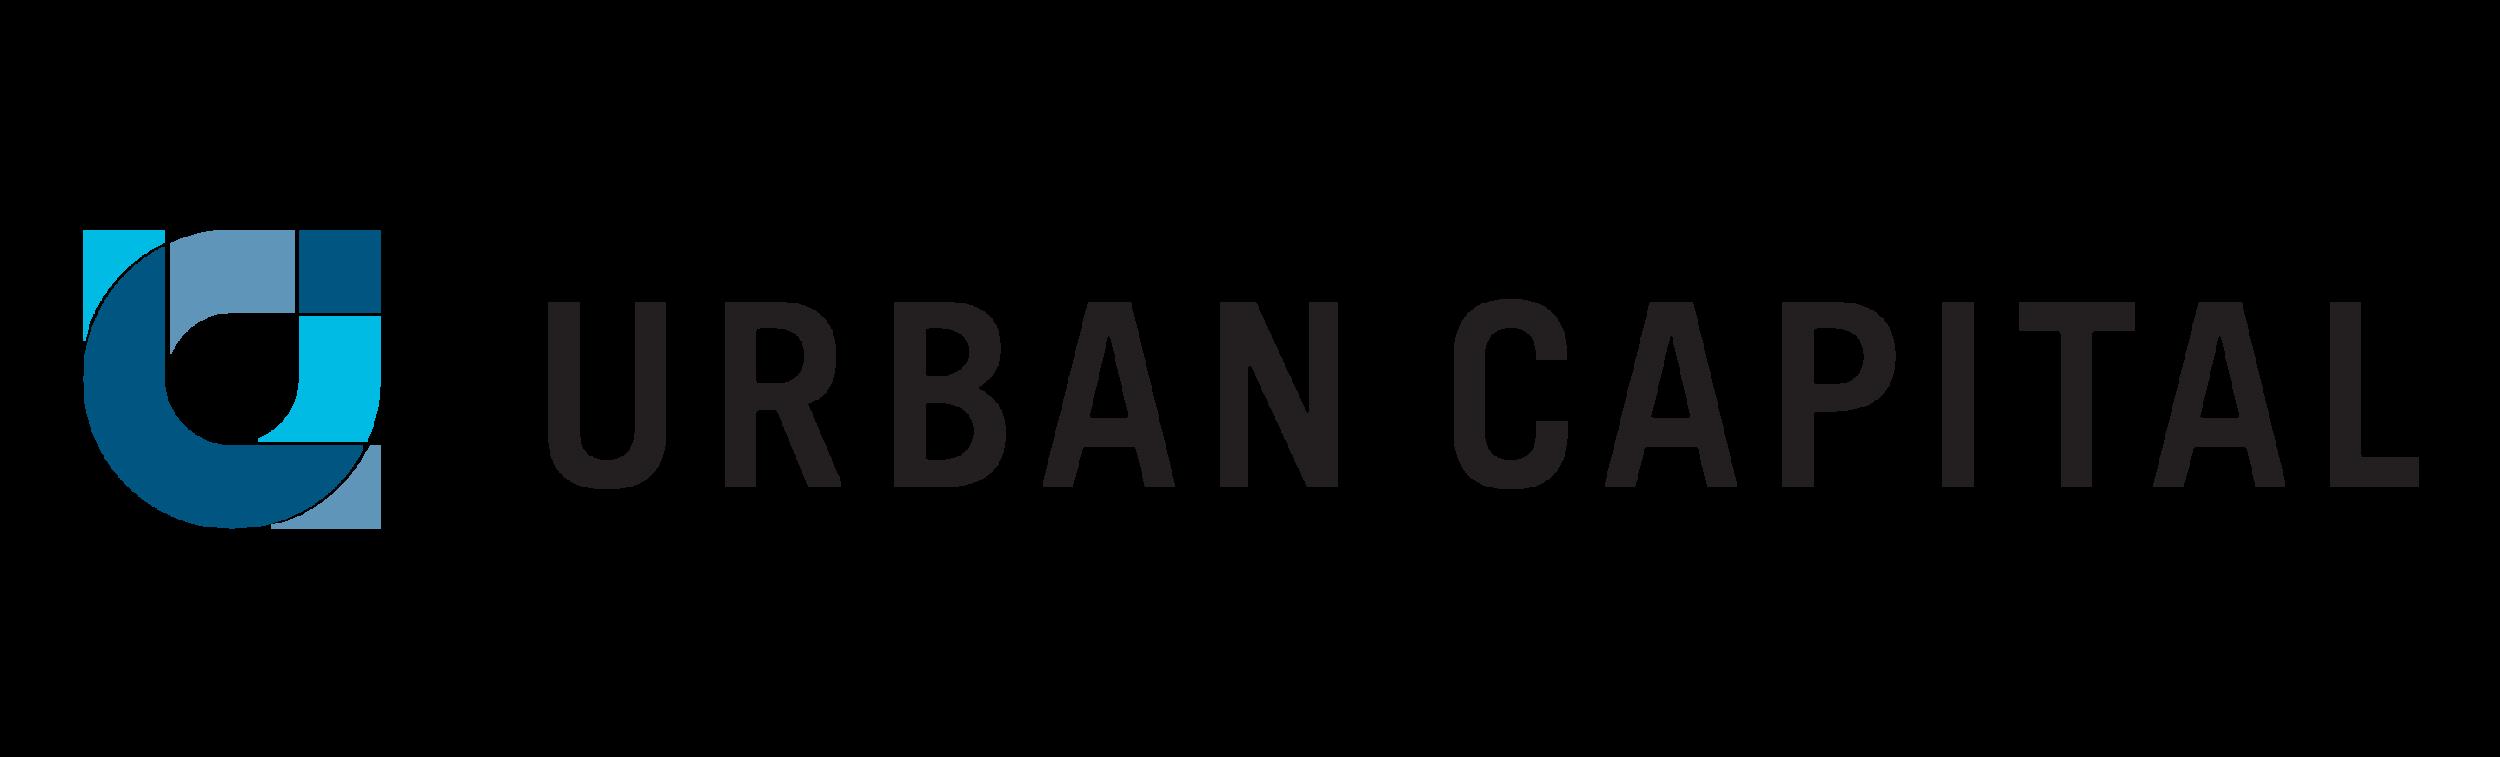 Urban-Capital-logo.png